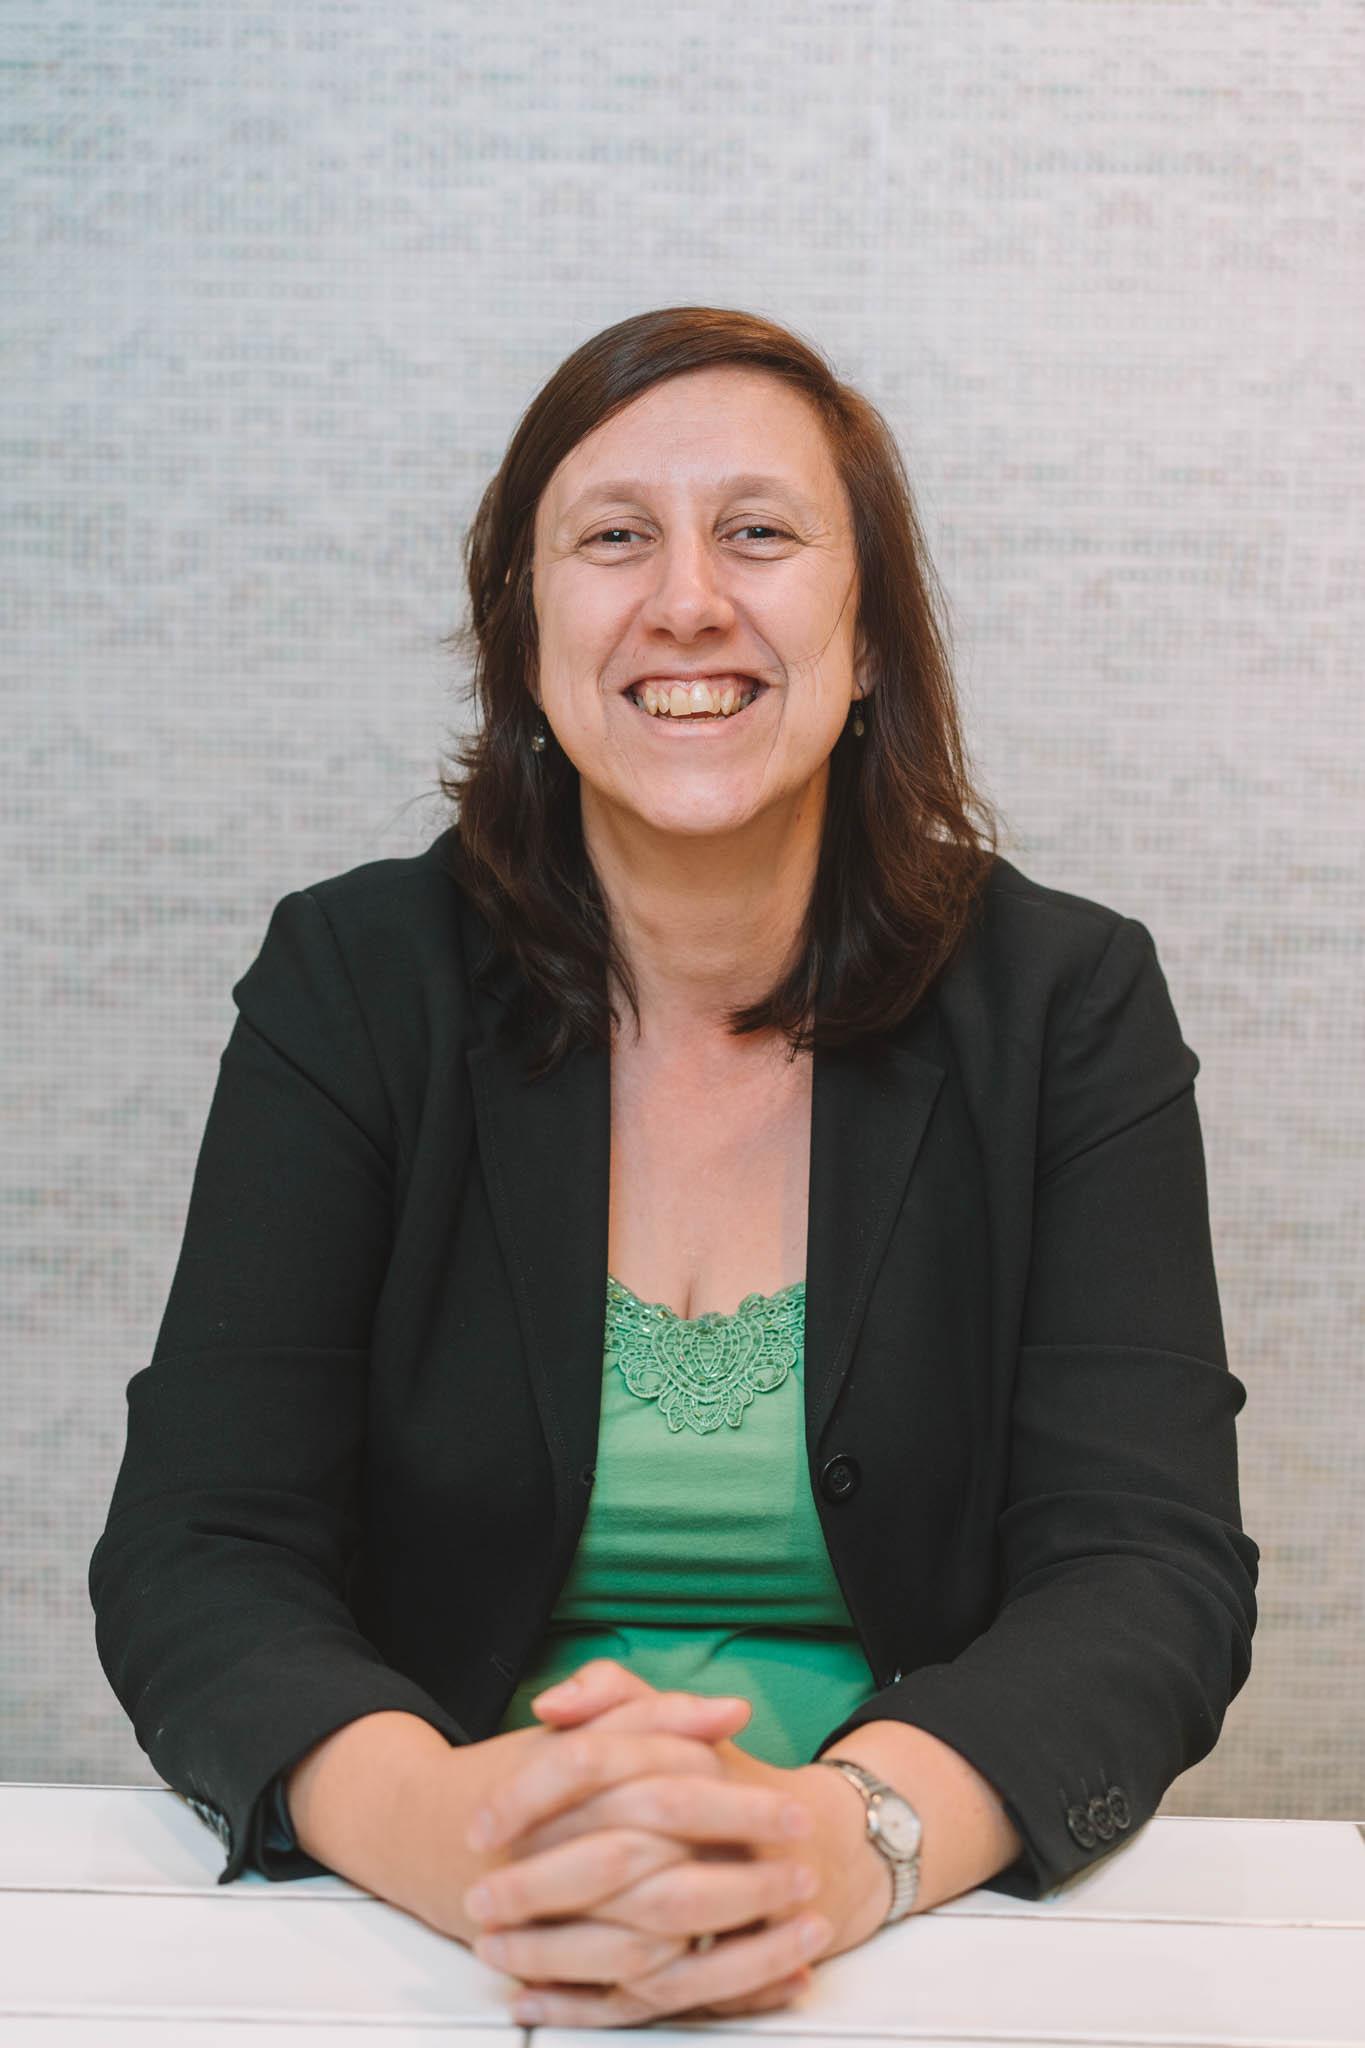 Karen Kundicevic